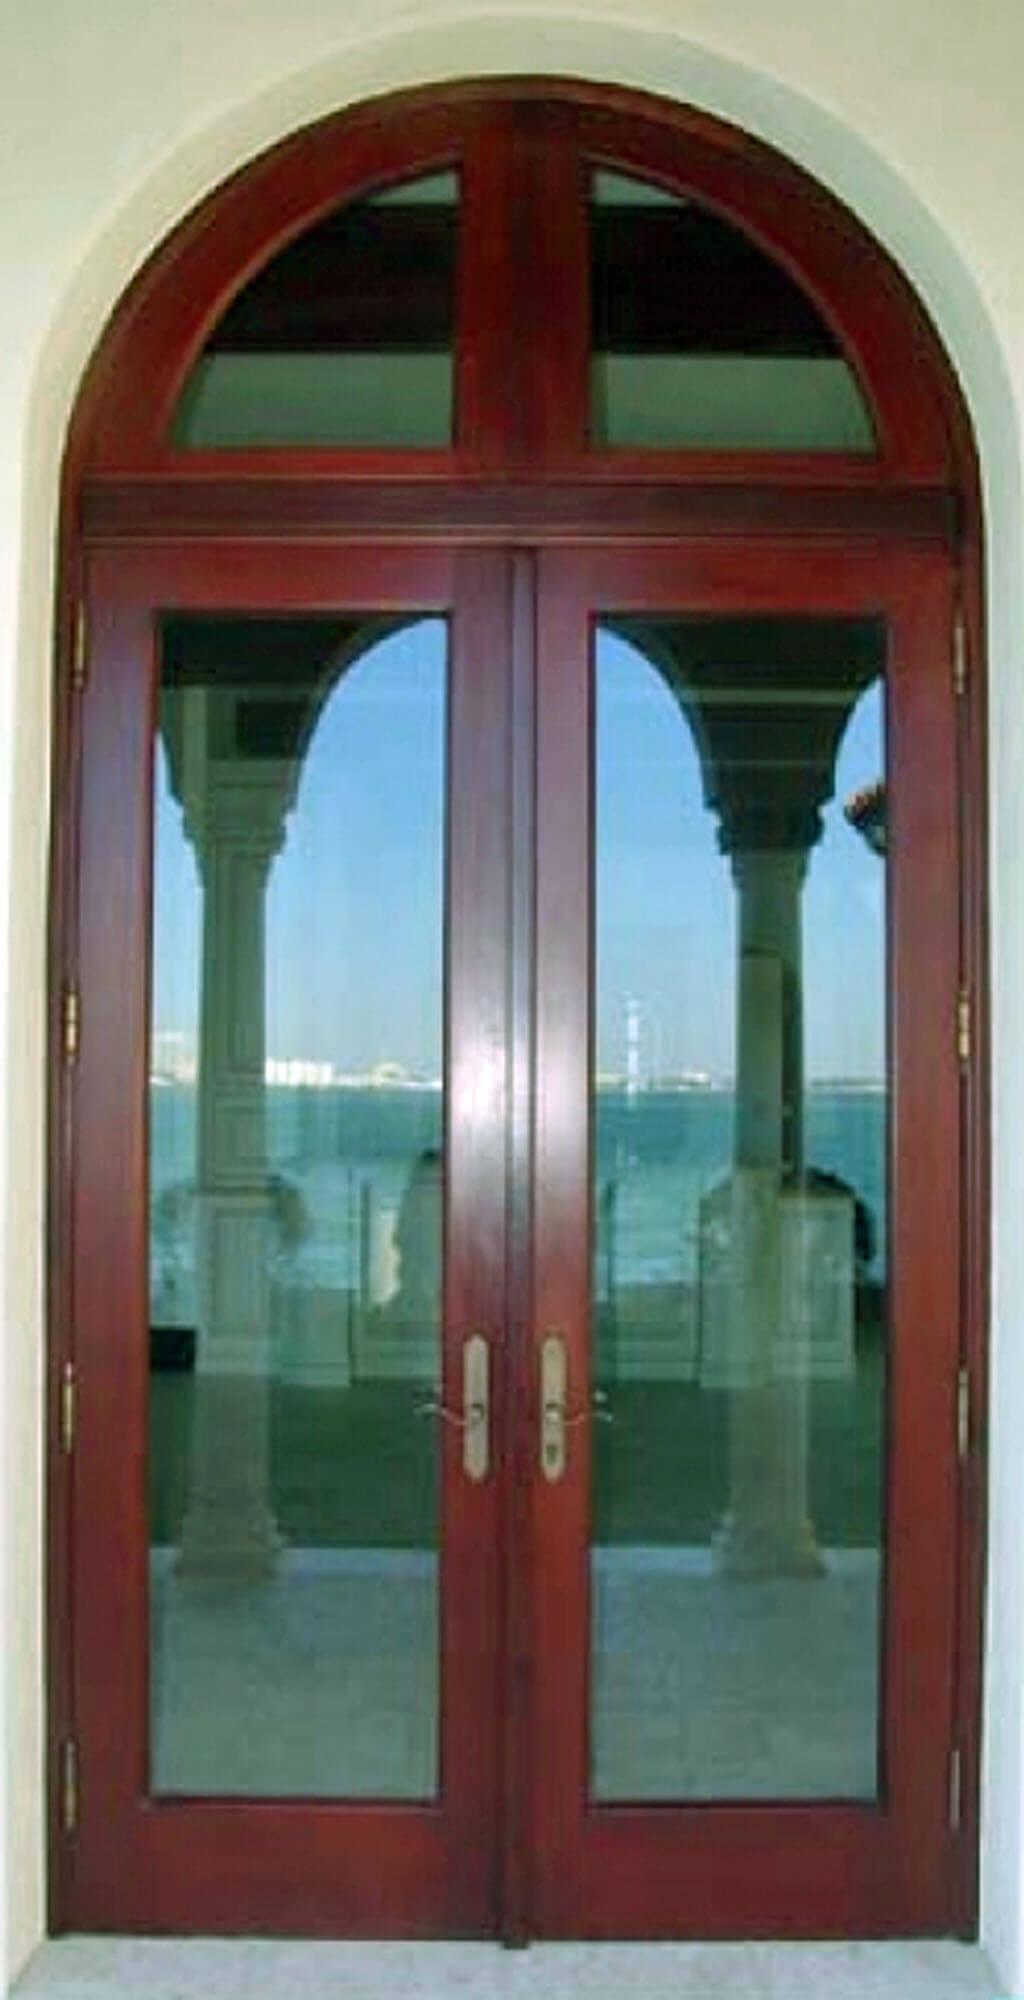 BISCAYNE POINT MAHOGANY BAY FRENCH DOORS.